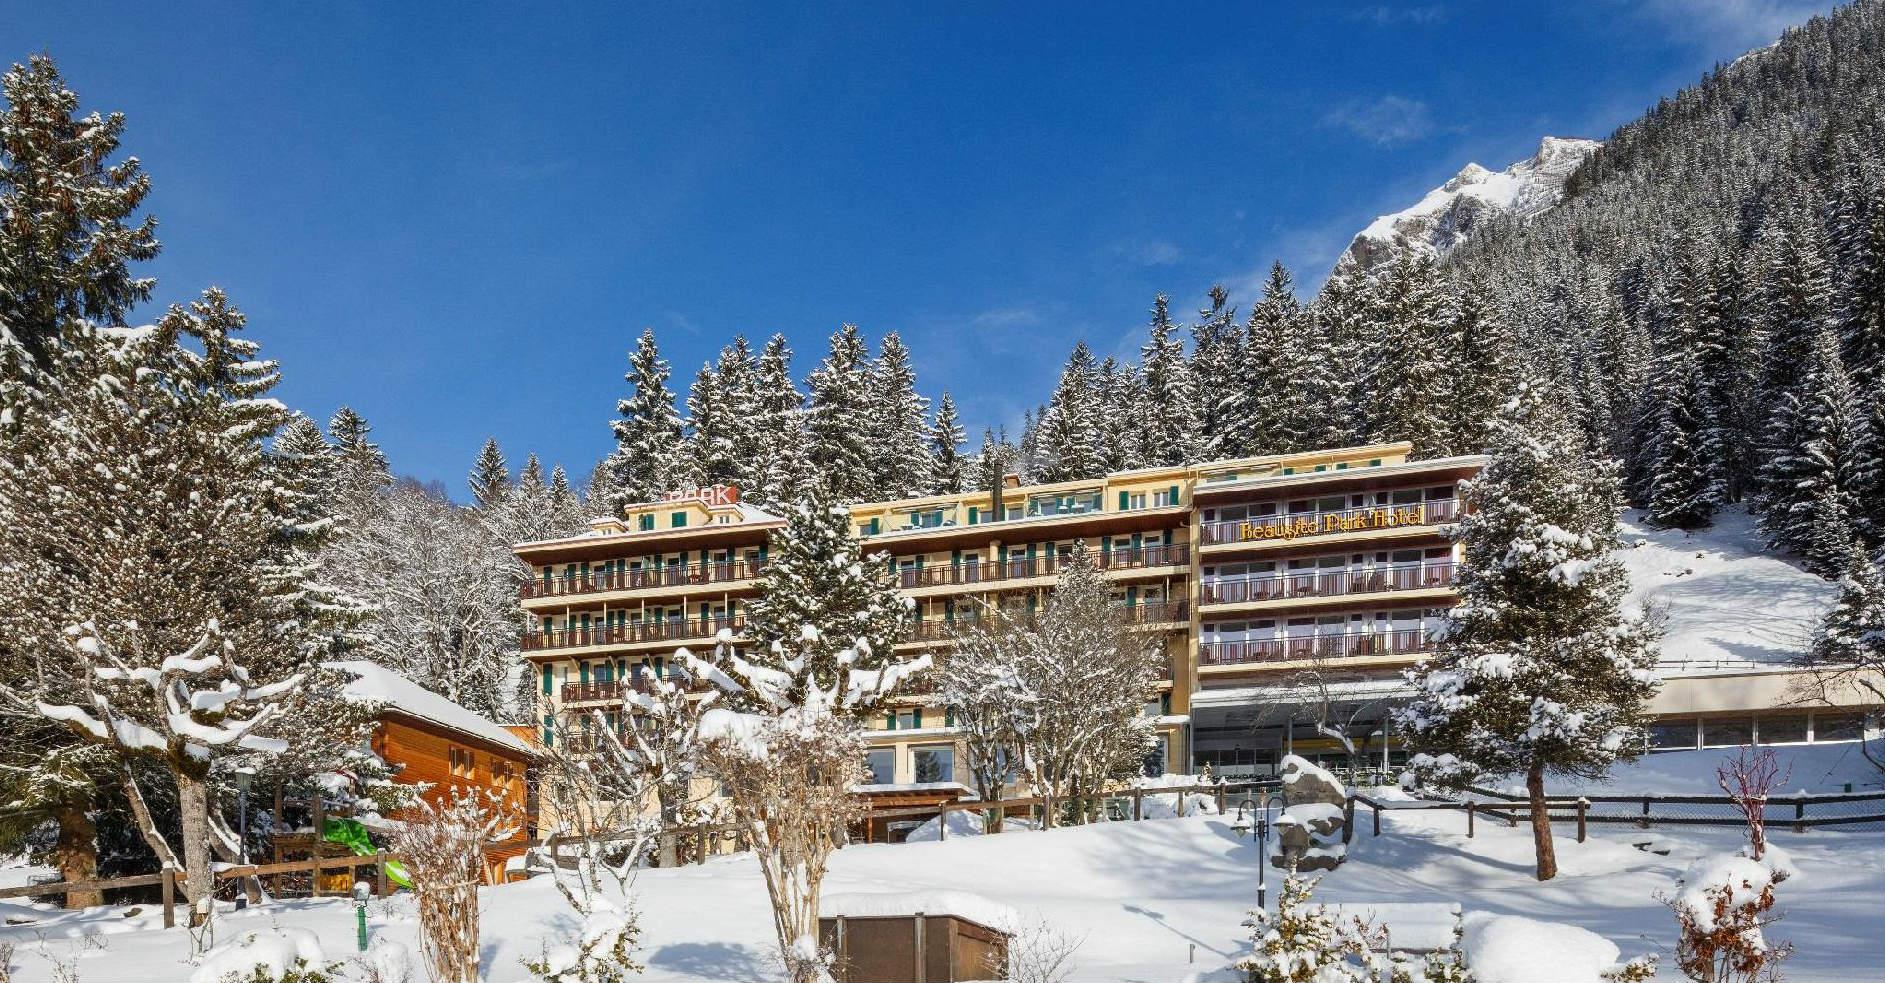 Beausite Park Hotel Wengen SkiBookings.com